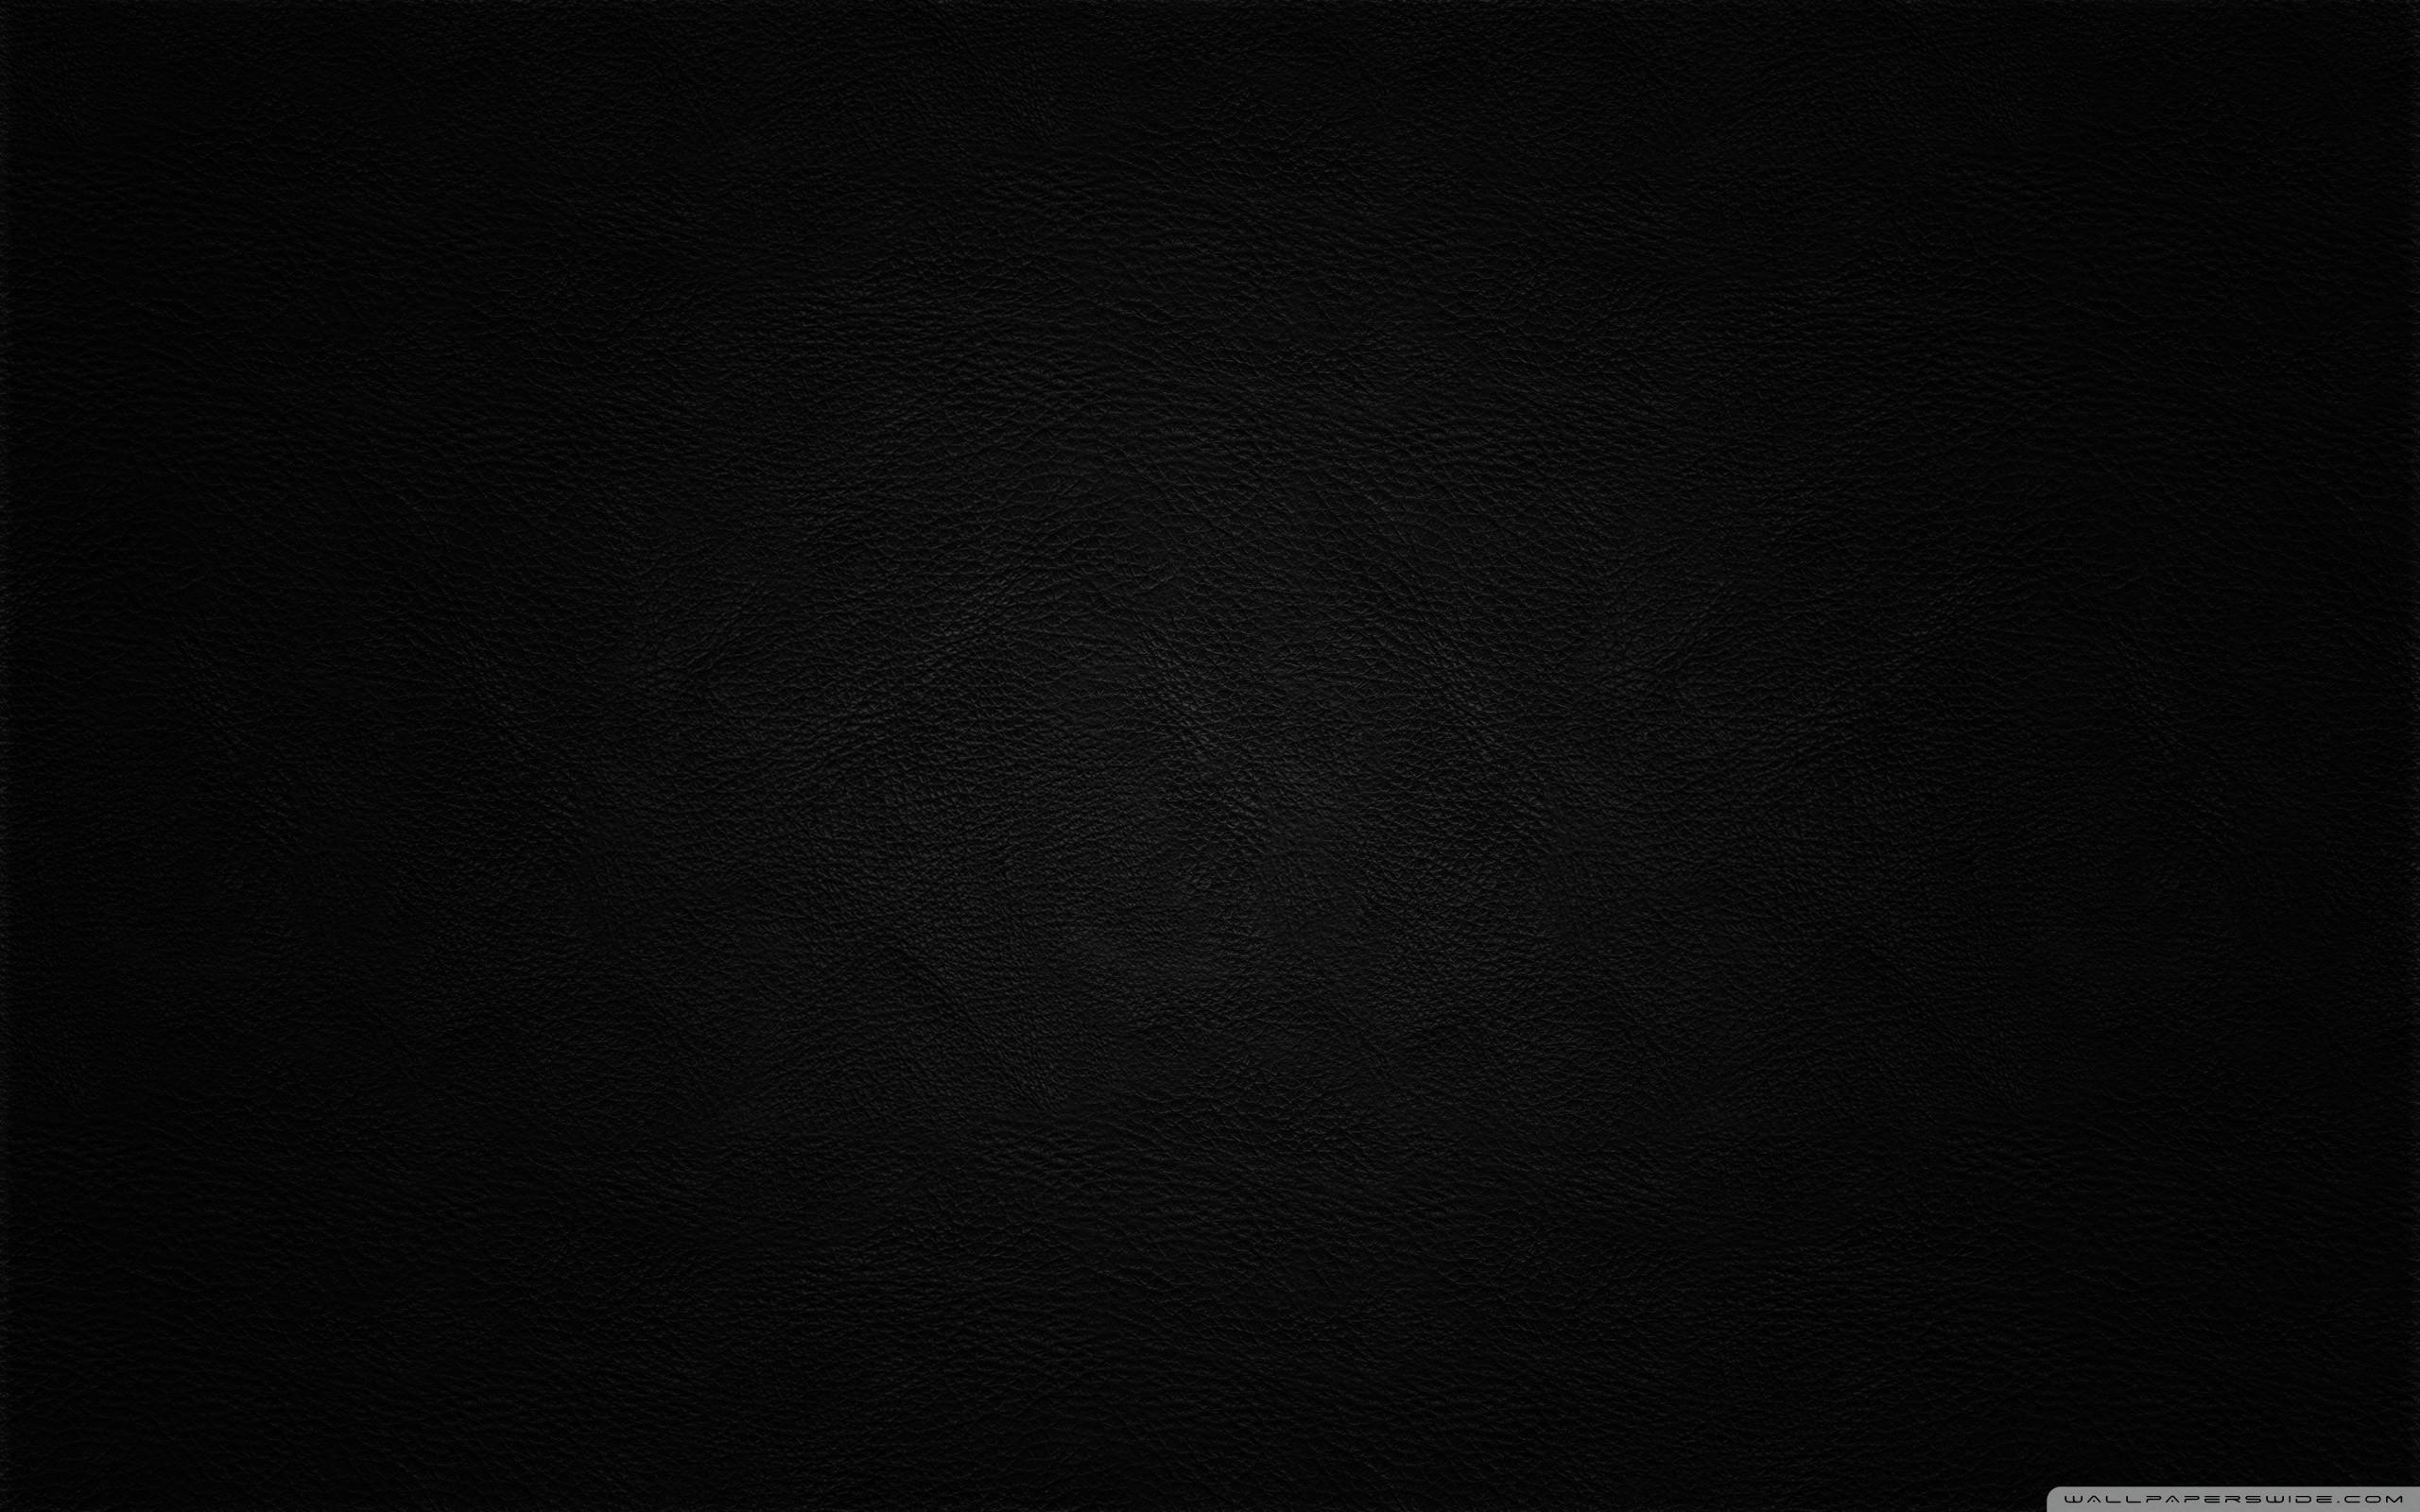 black background-49